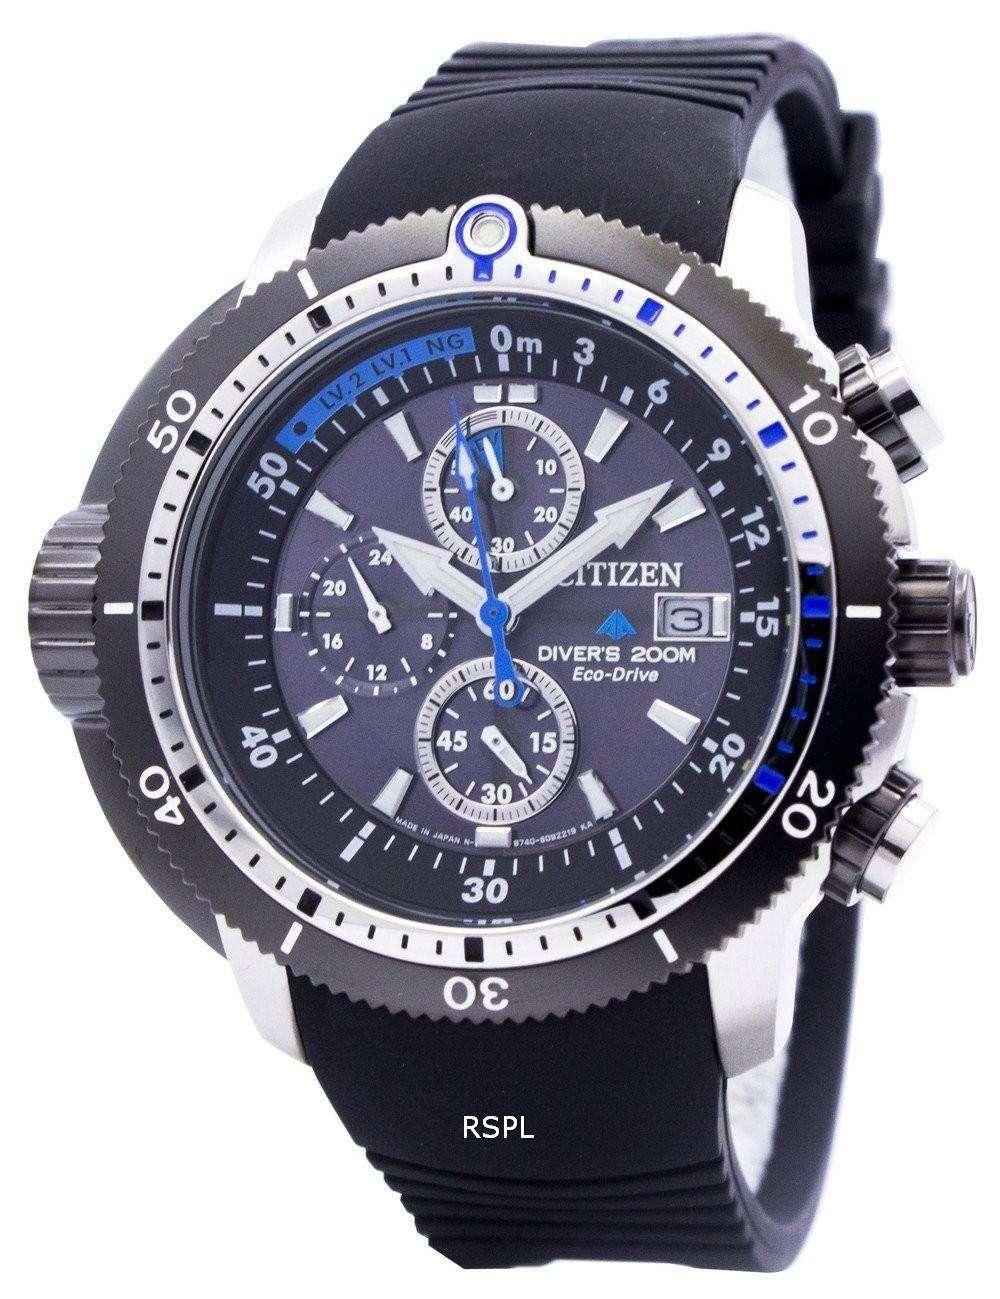 Citizen promaster eco drive aqualand diver watch bj2120 07e bj2120 07 bj2120 - Citizen promaster dive watch ...